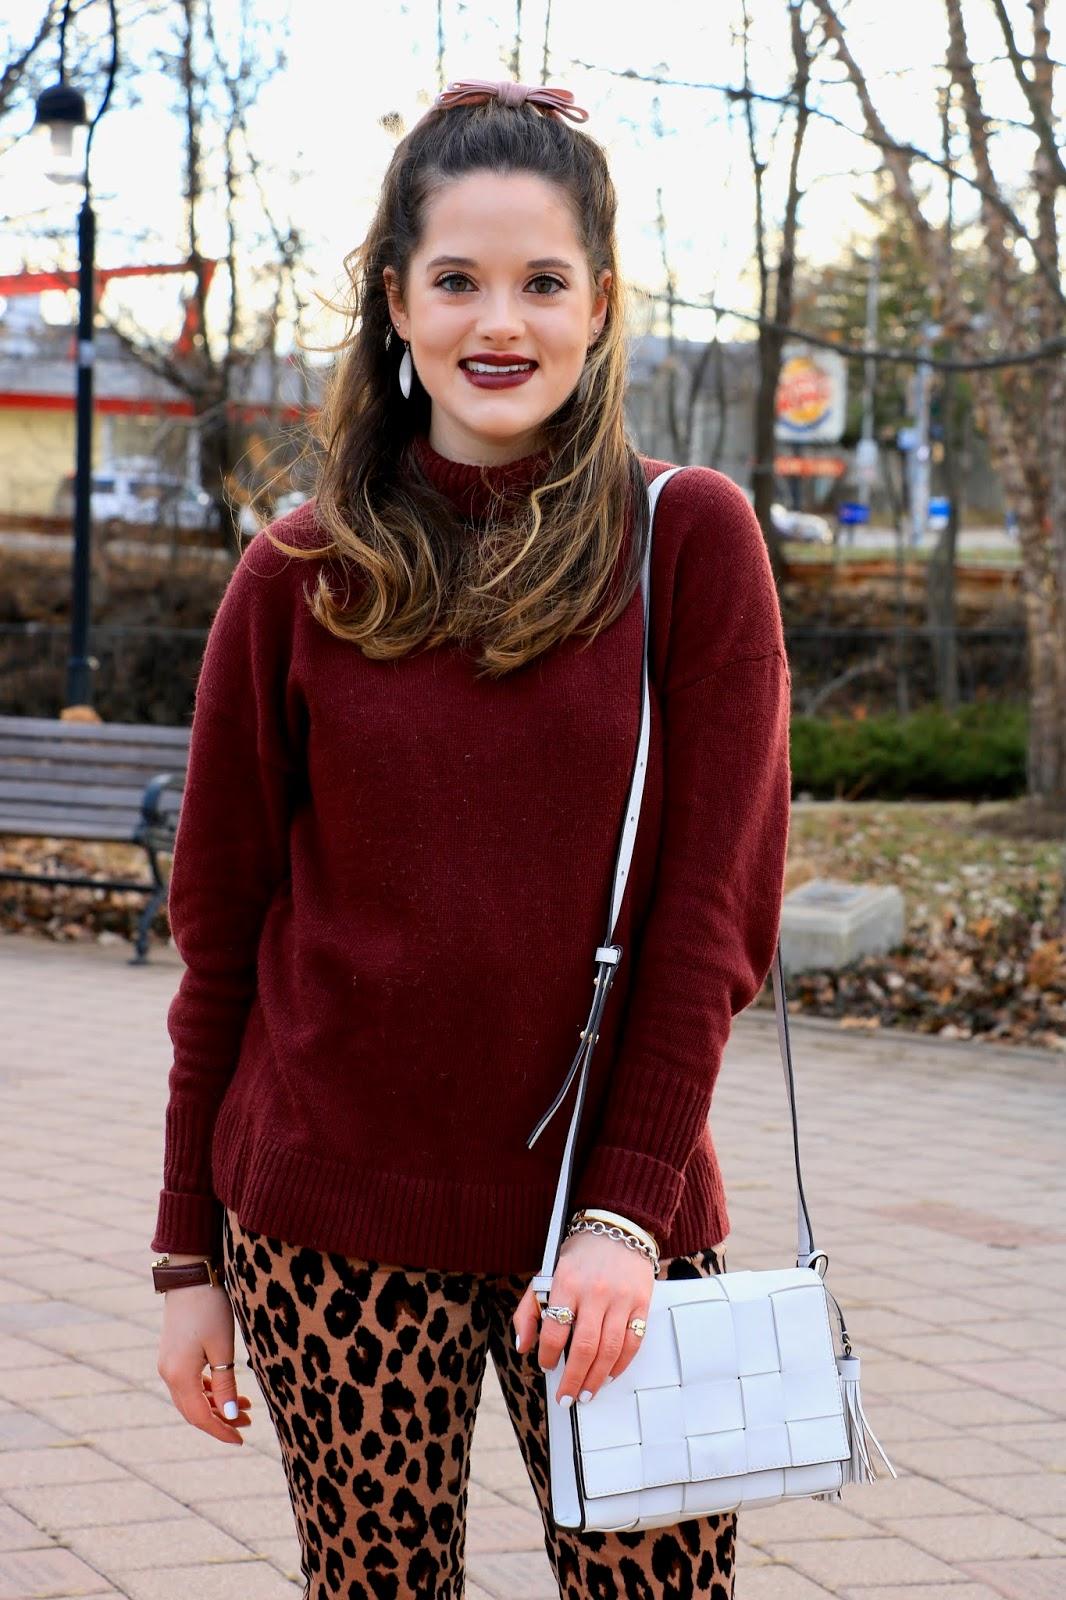 Nyc fashion blogger Kathleen Harper's Valentine's Day makeup